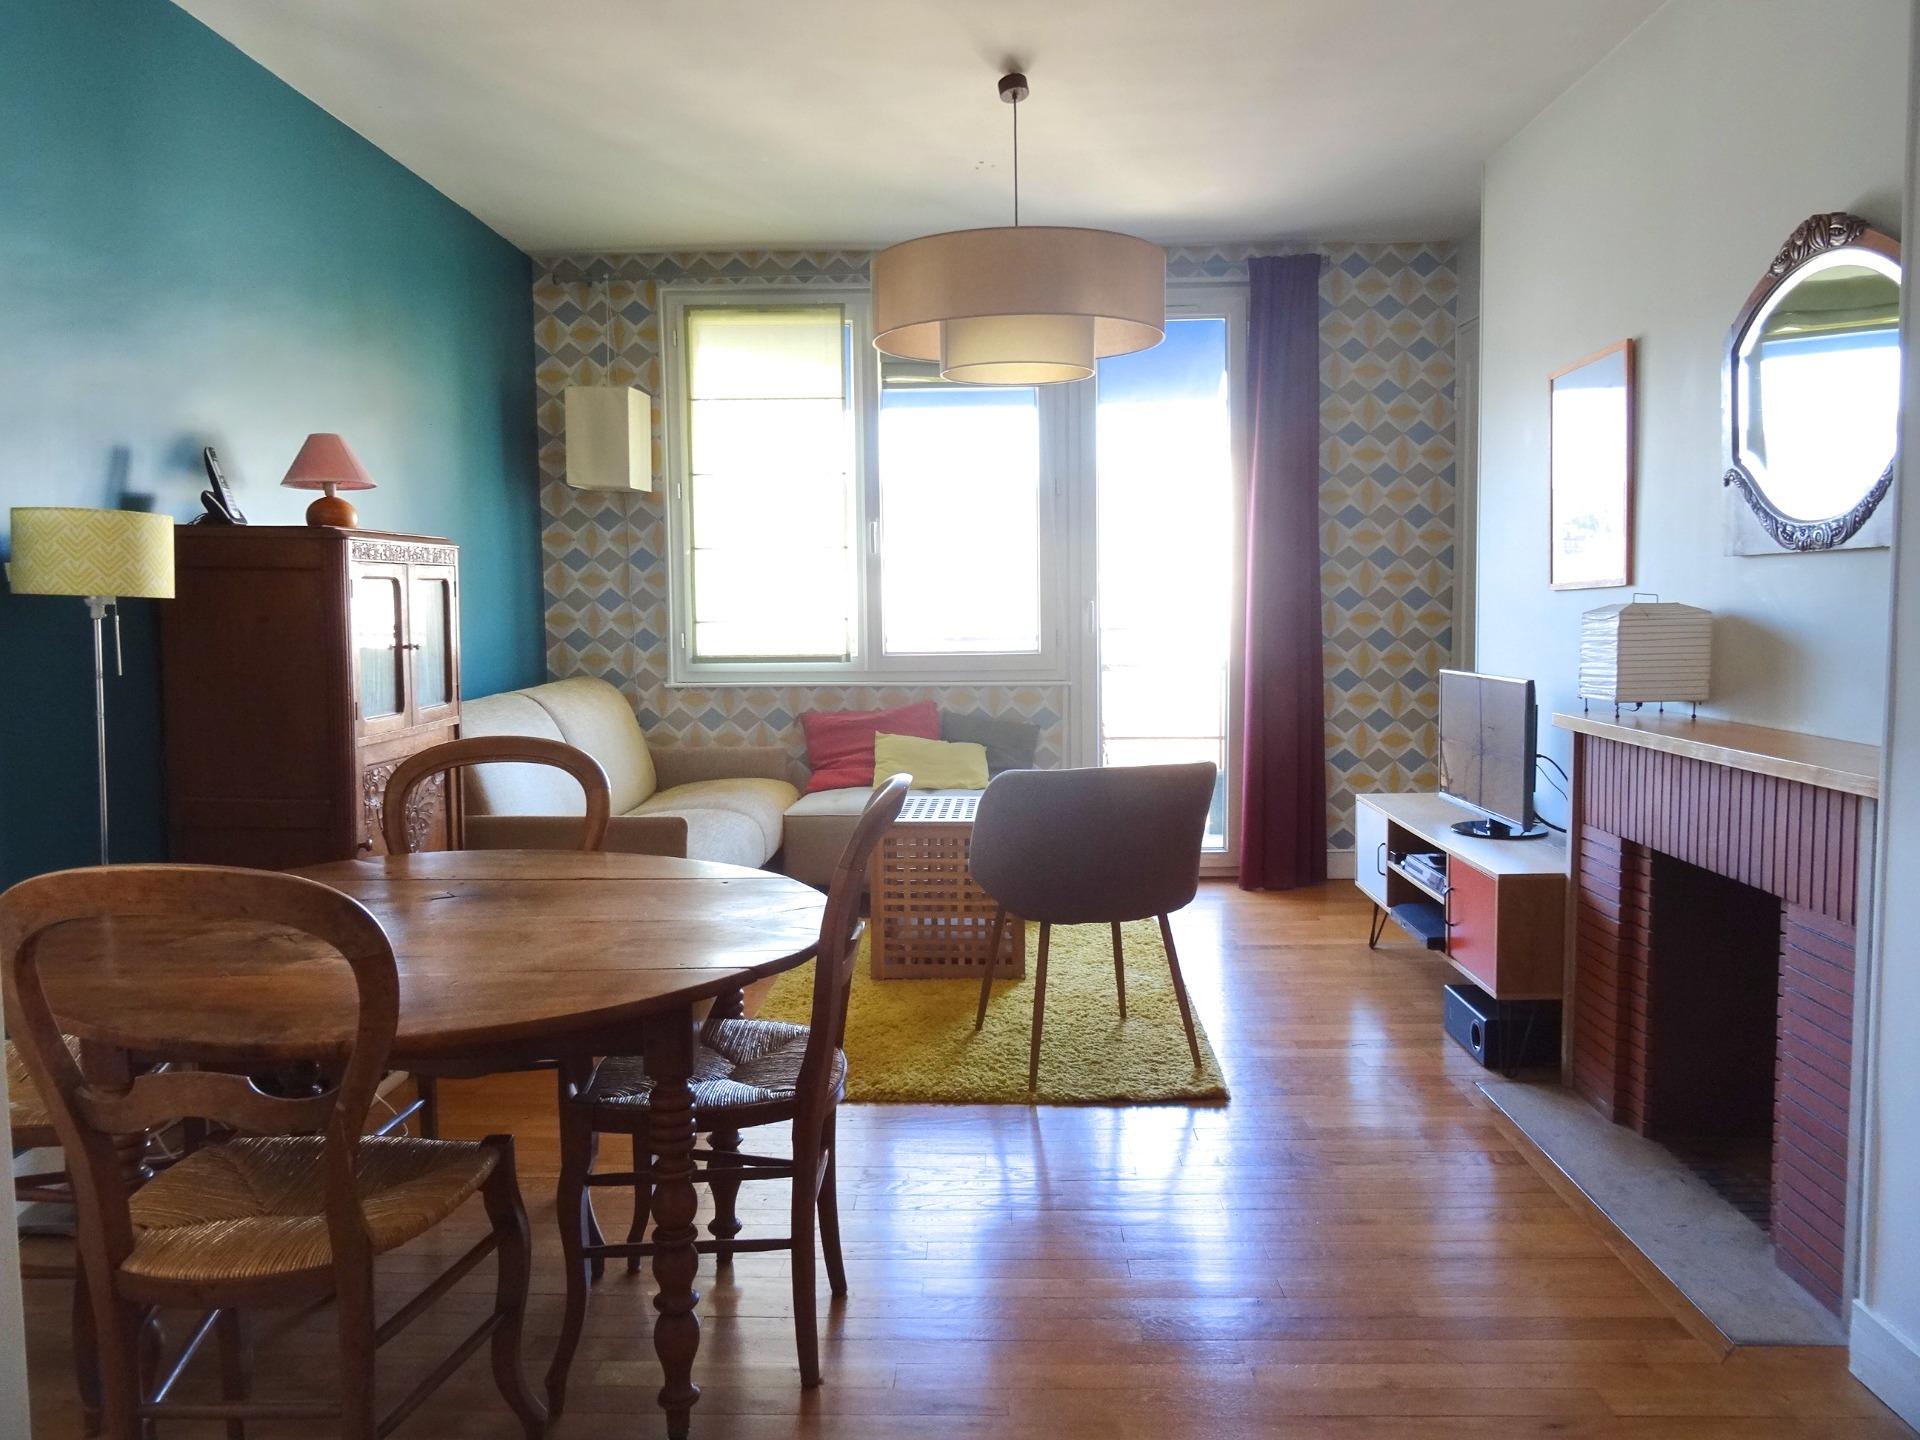 cheminee-location-meublee-boulogne- la-clef-des-villes-agence-immobiliere-boulogne